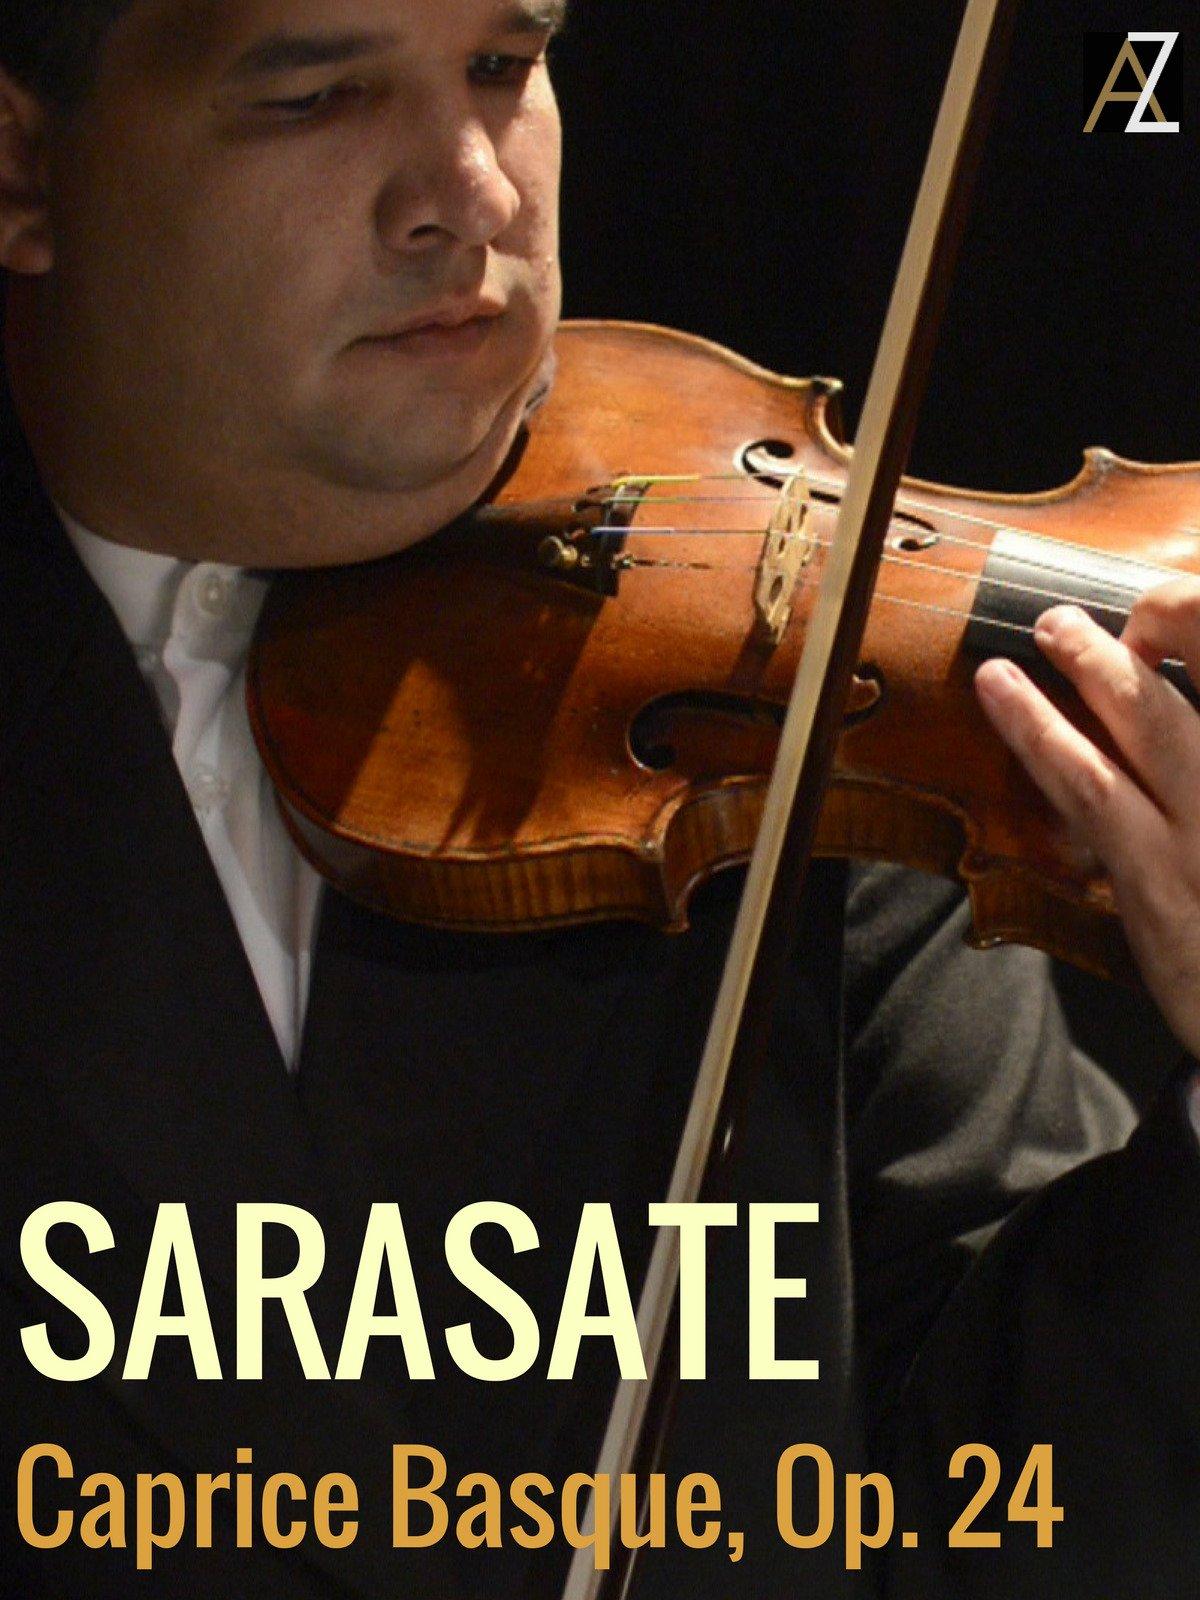 Sarasate: Caprice Basque, Op. 24